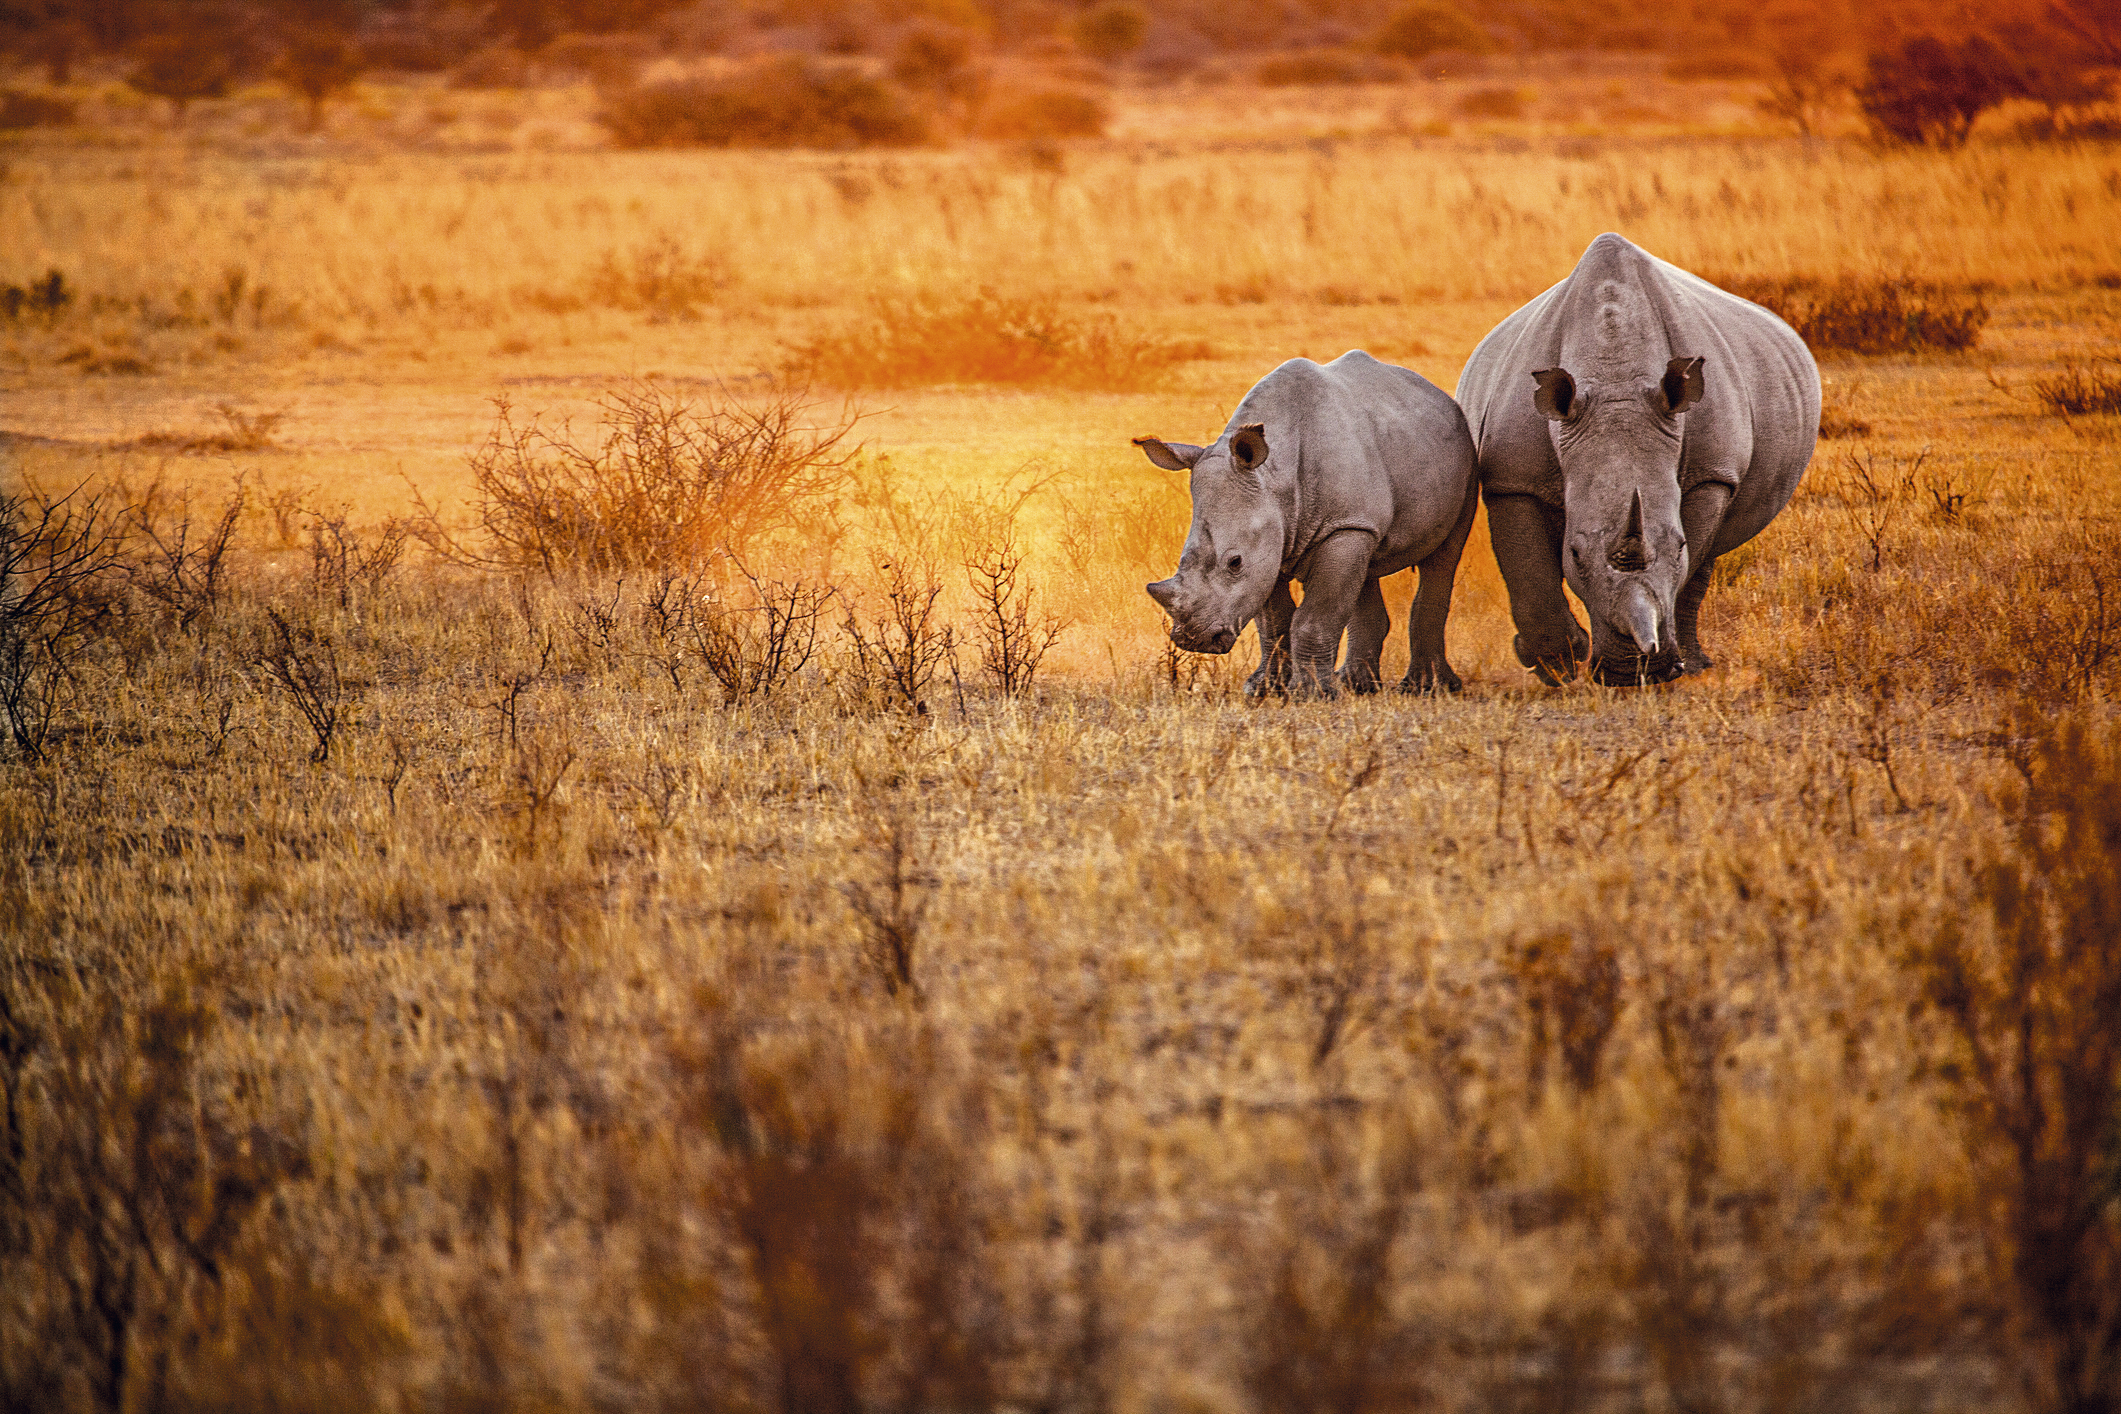 Rinocerontes nos arredores de Windhoek, capital da Namíbia